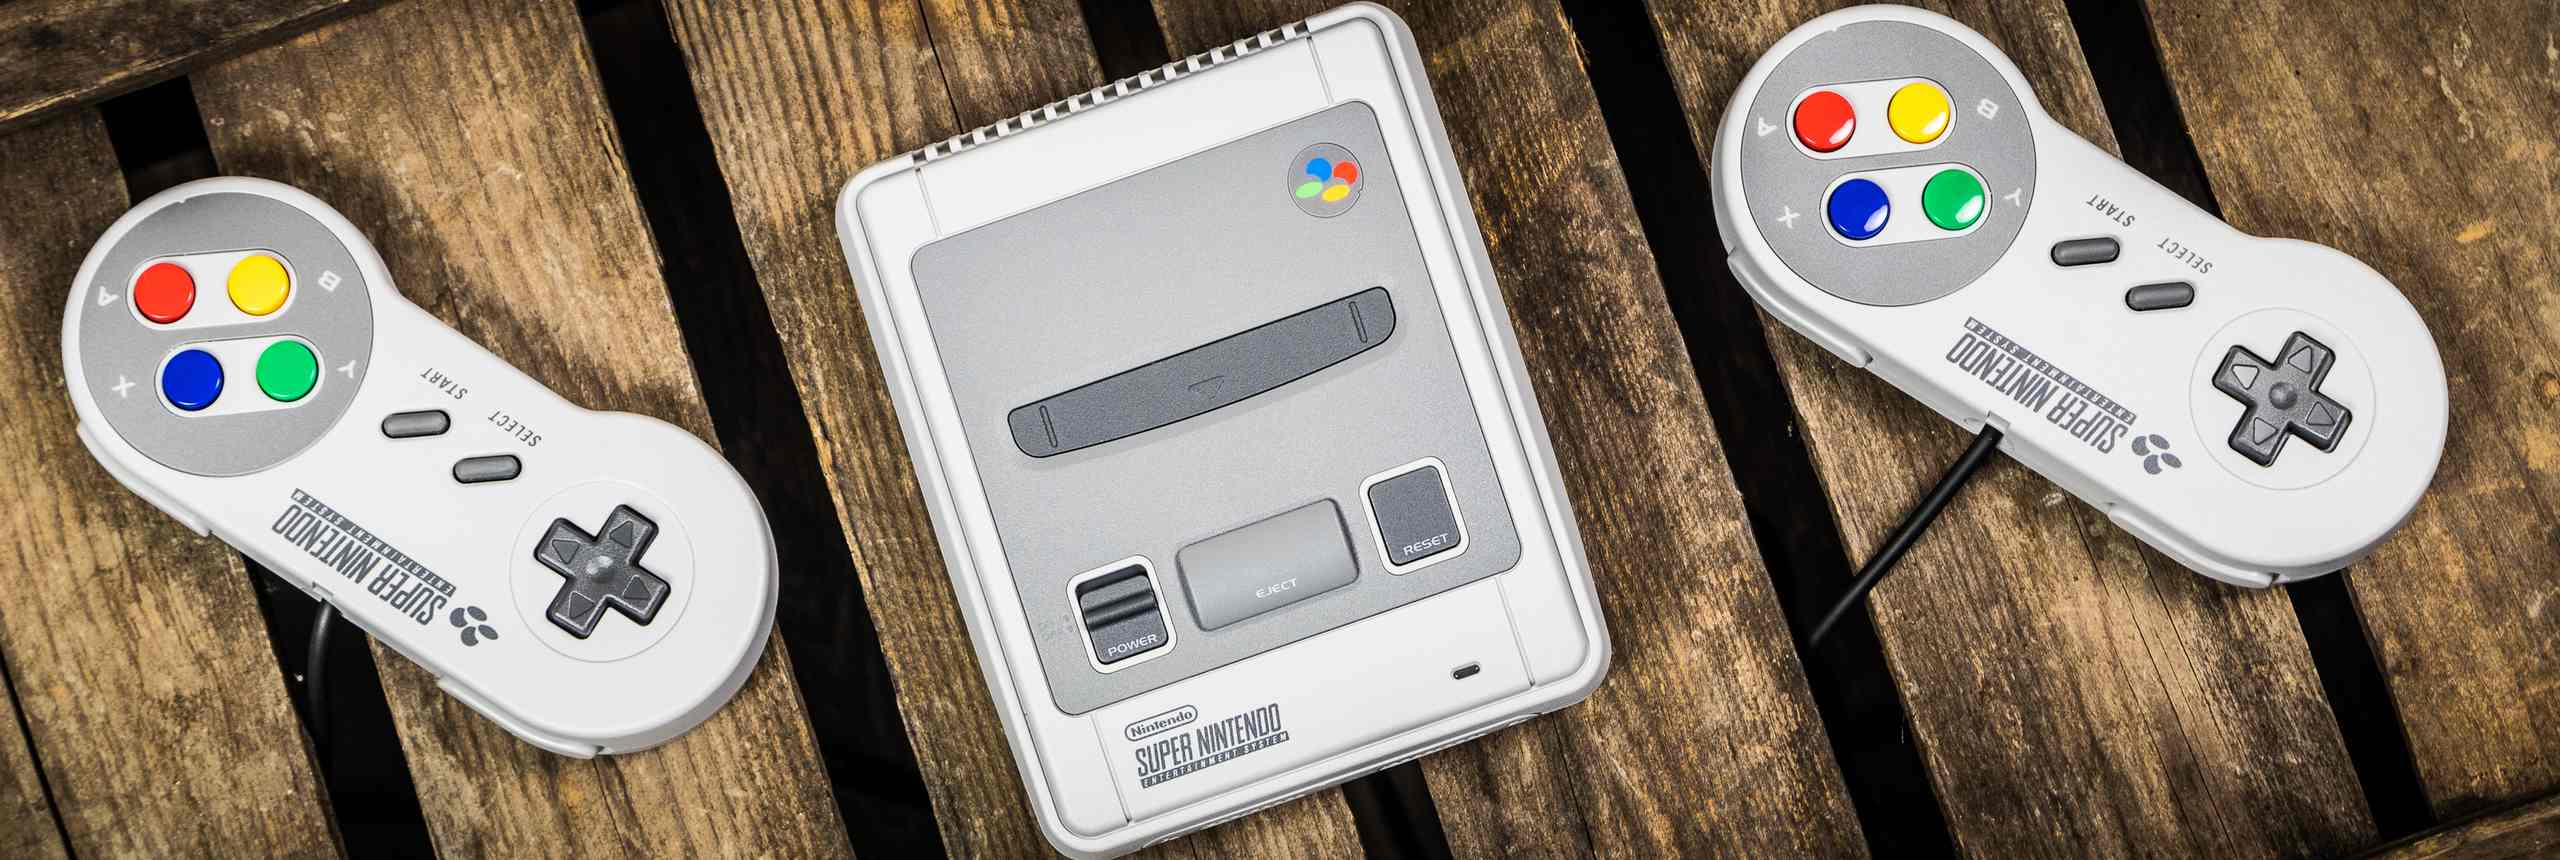 Name:  Nintendo Classic Mini - Super Nintendo Entertainment System.jpg Views: 47 Size:  189.2 KB